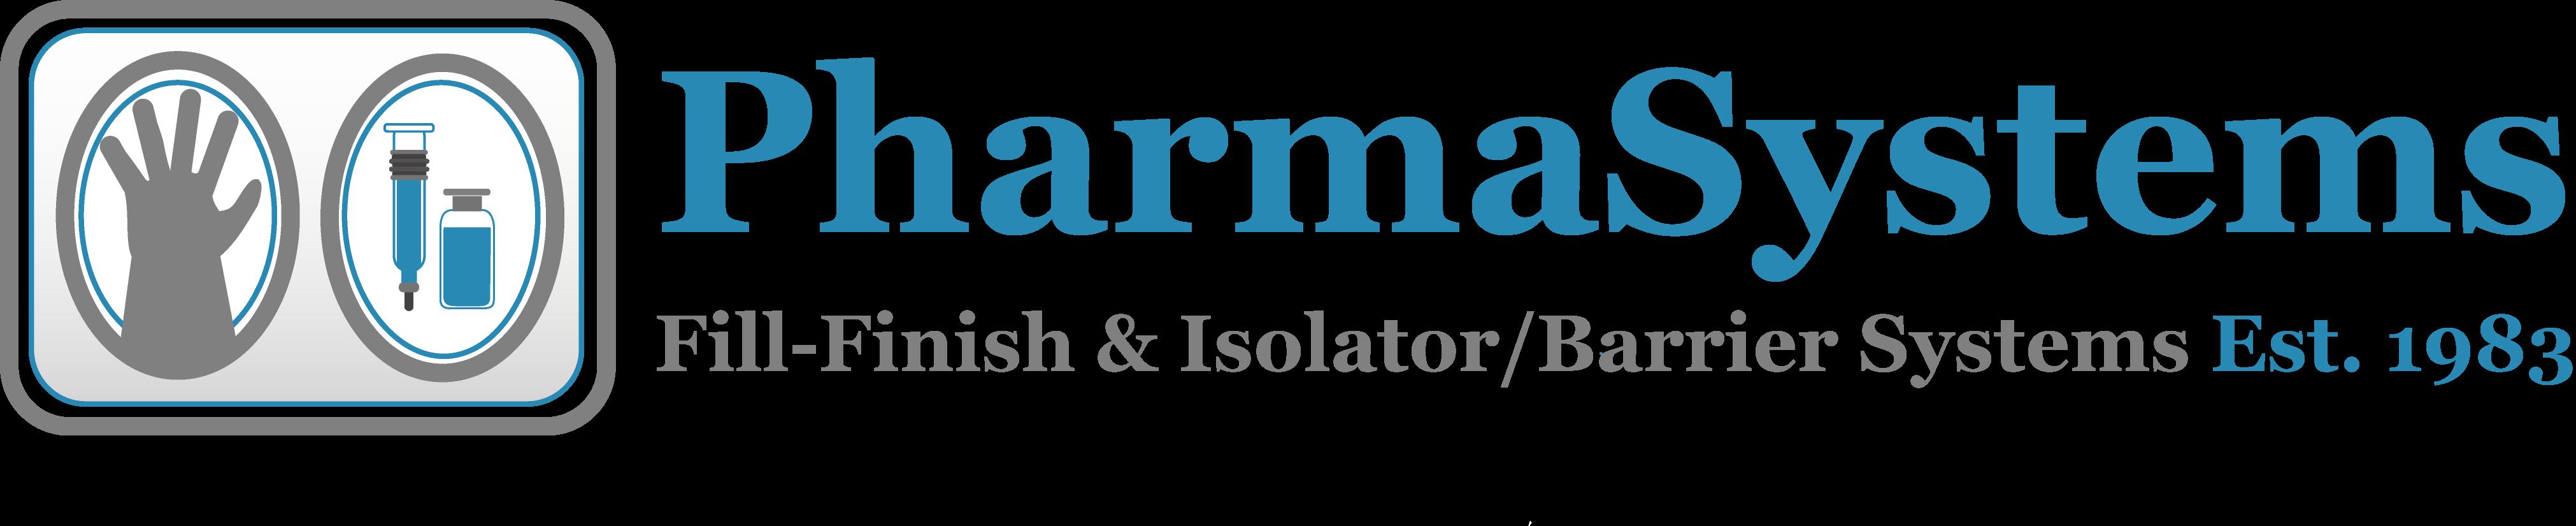 PharmaSystems